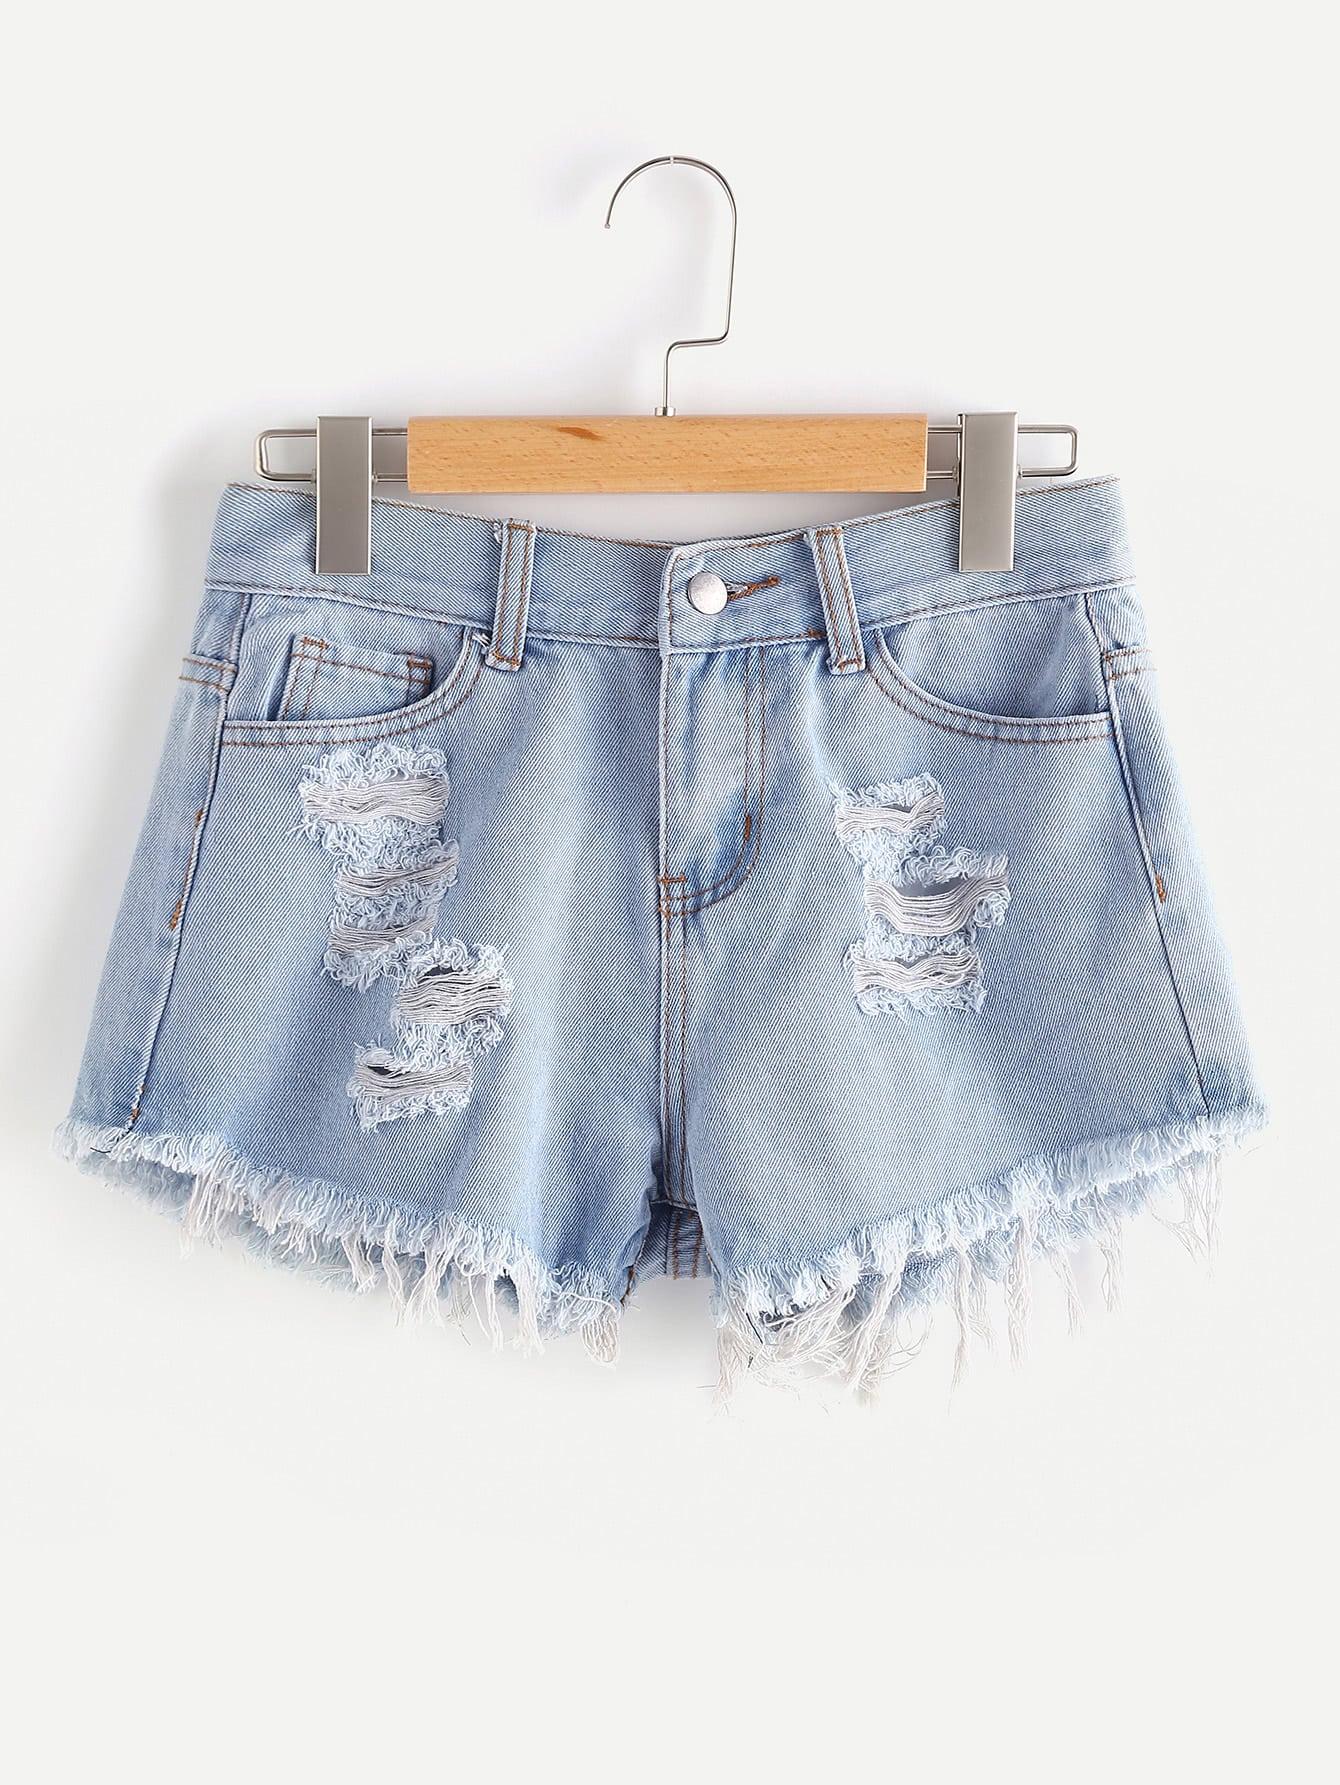 Faded Wash Distressed Denim Shorts